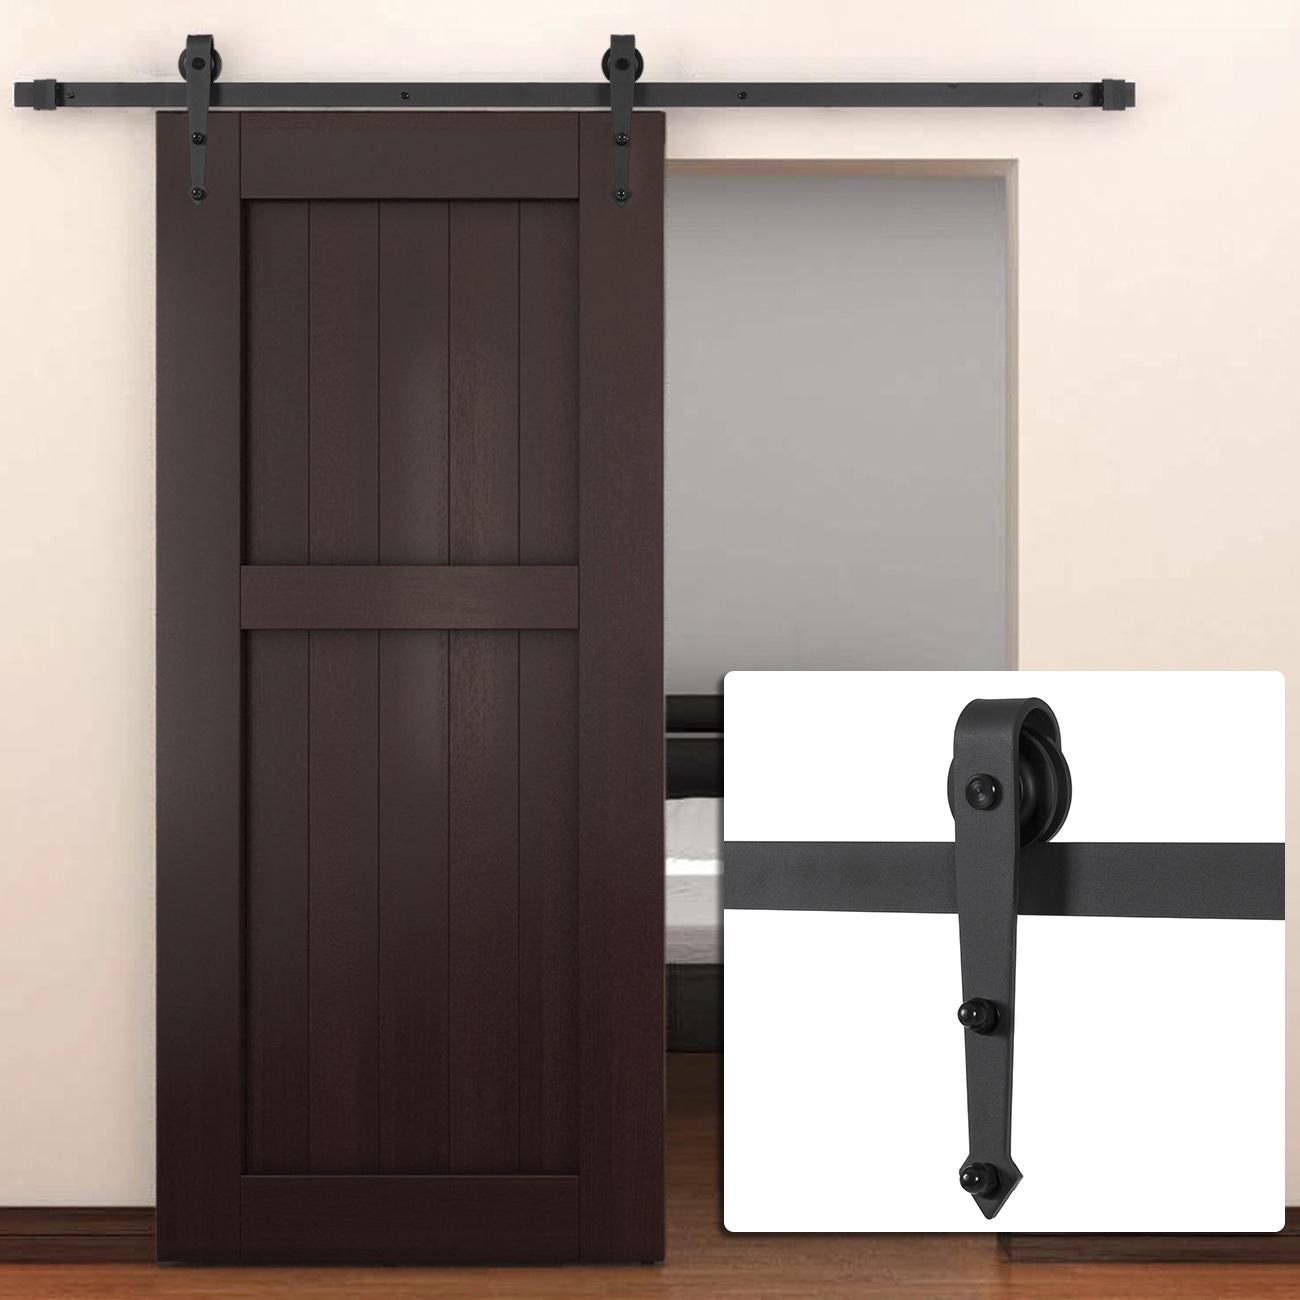 Sliding Doors Hardware: 6 FT Modern American Steel Sliding Barn Door Hardware